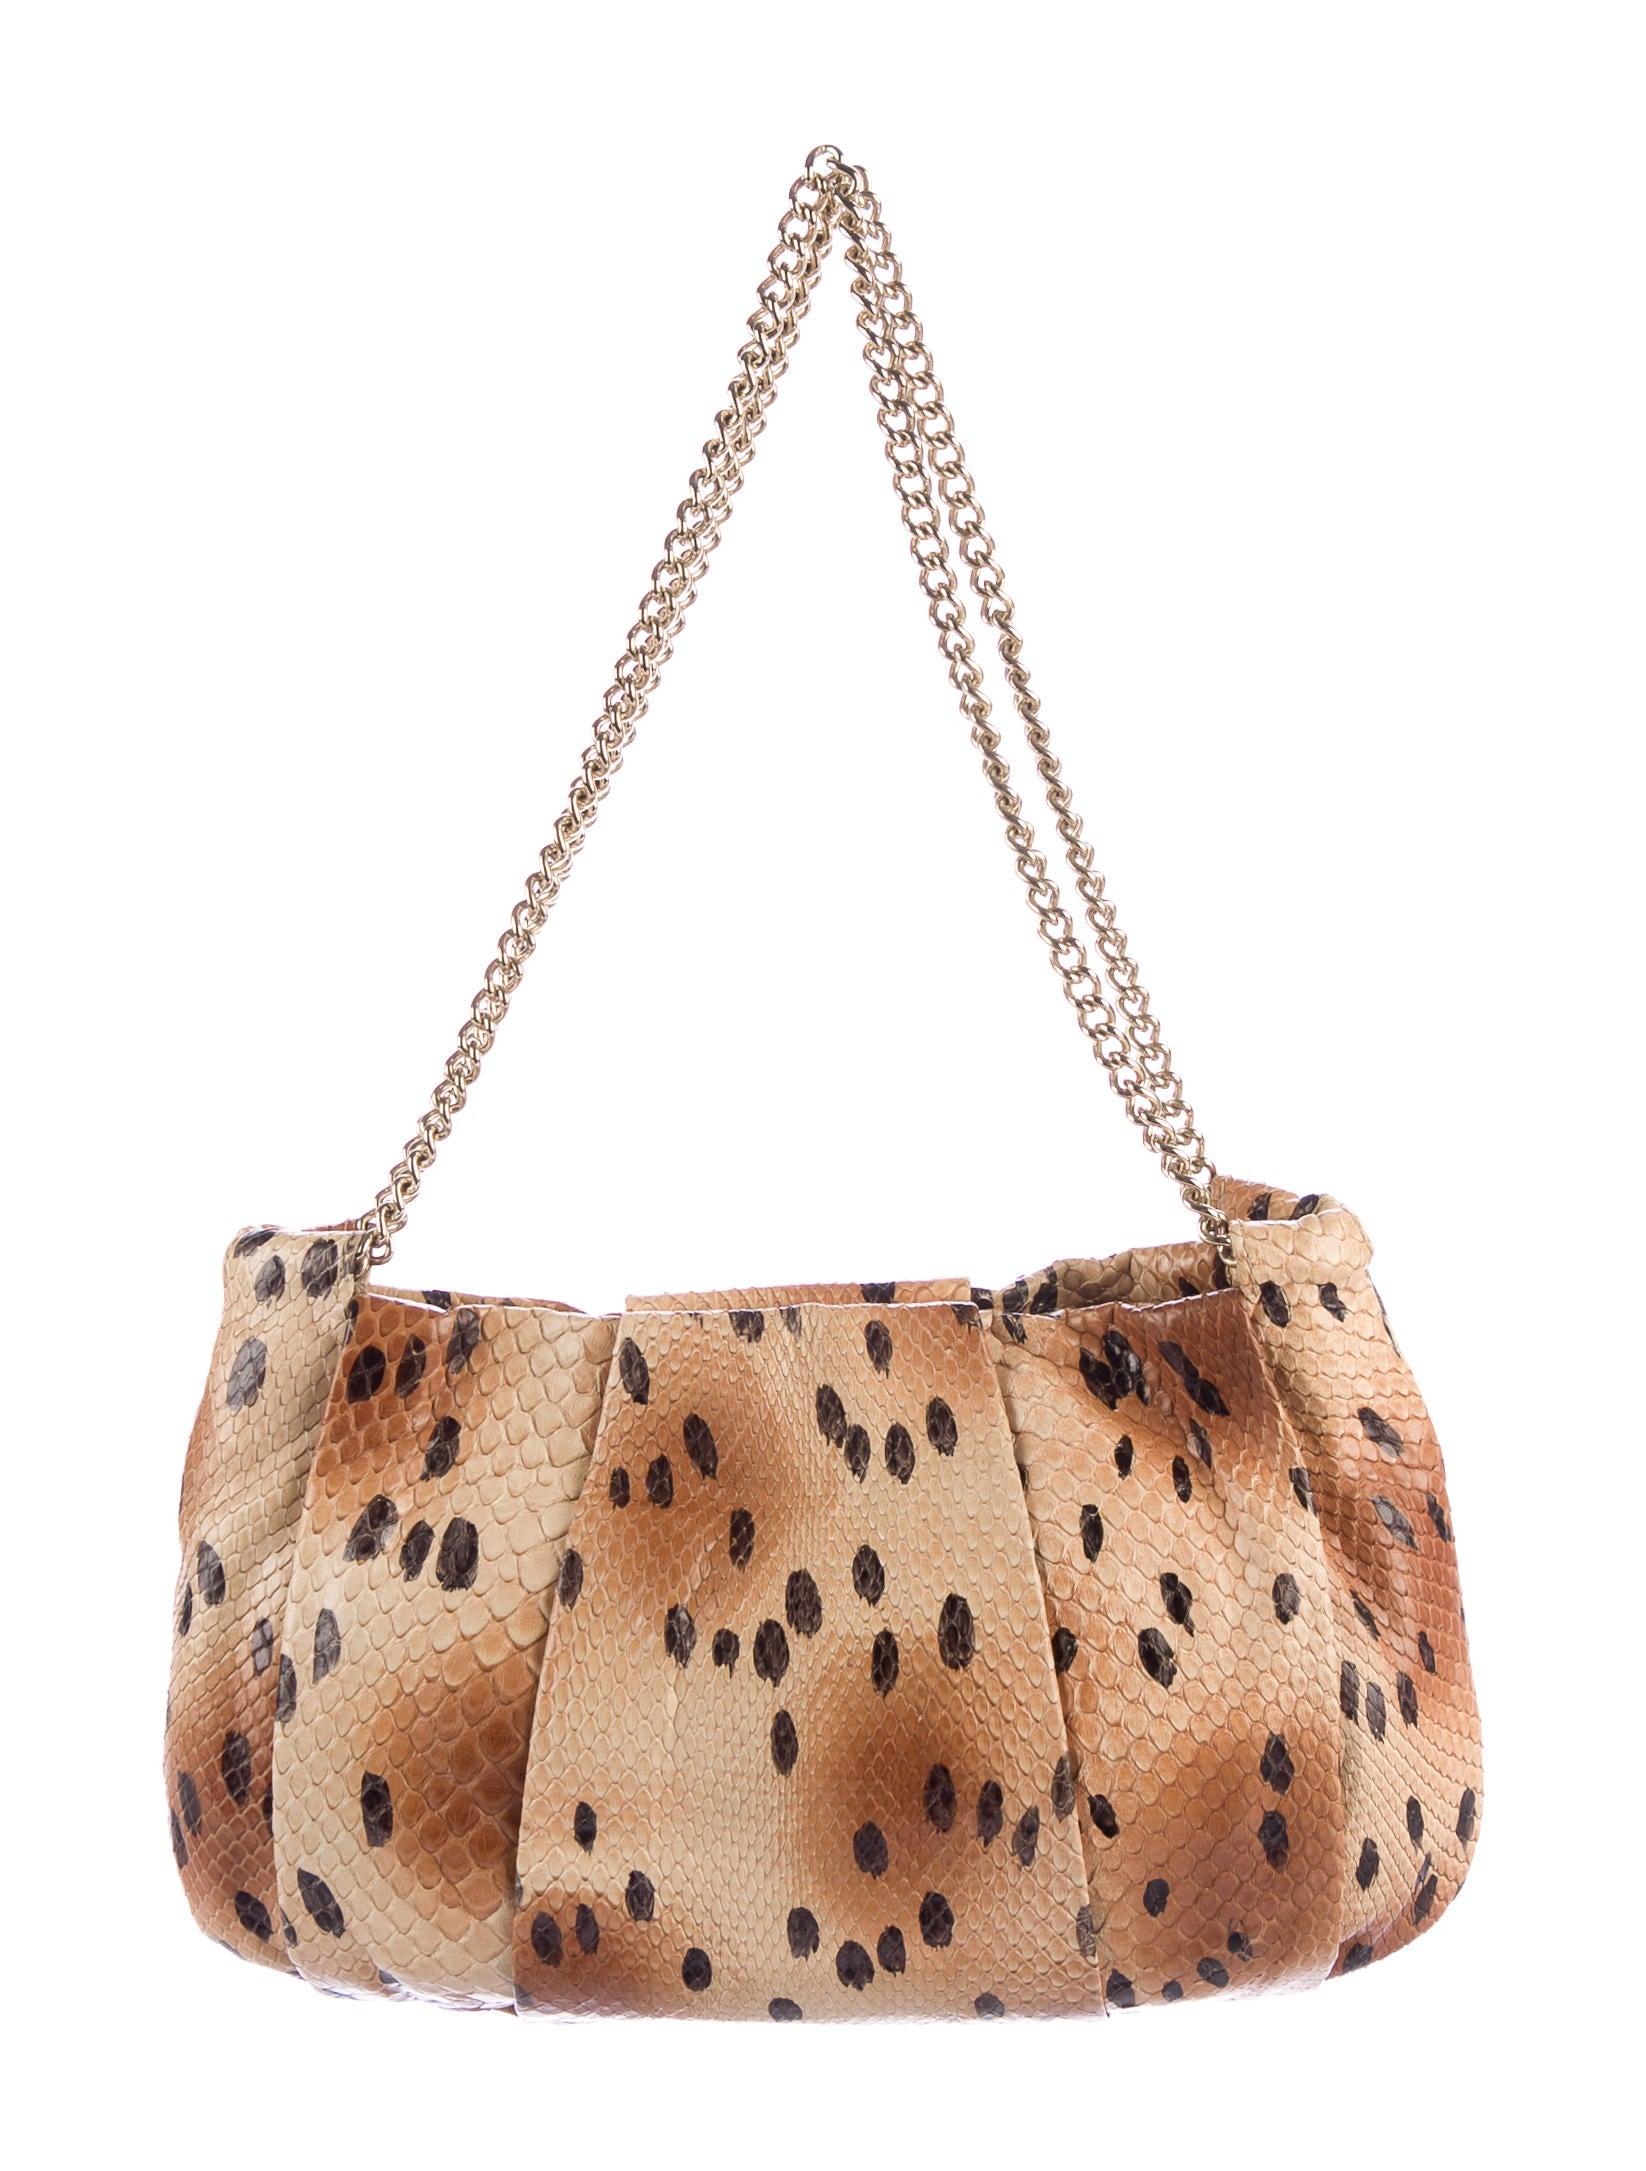 Christian Louboutin Snakeskin Shoulder Bag Handbags